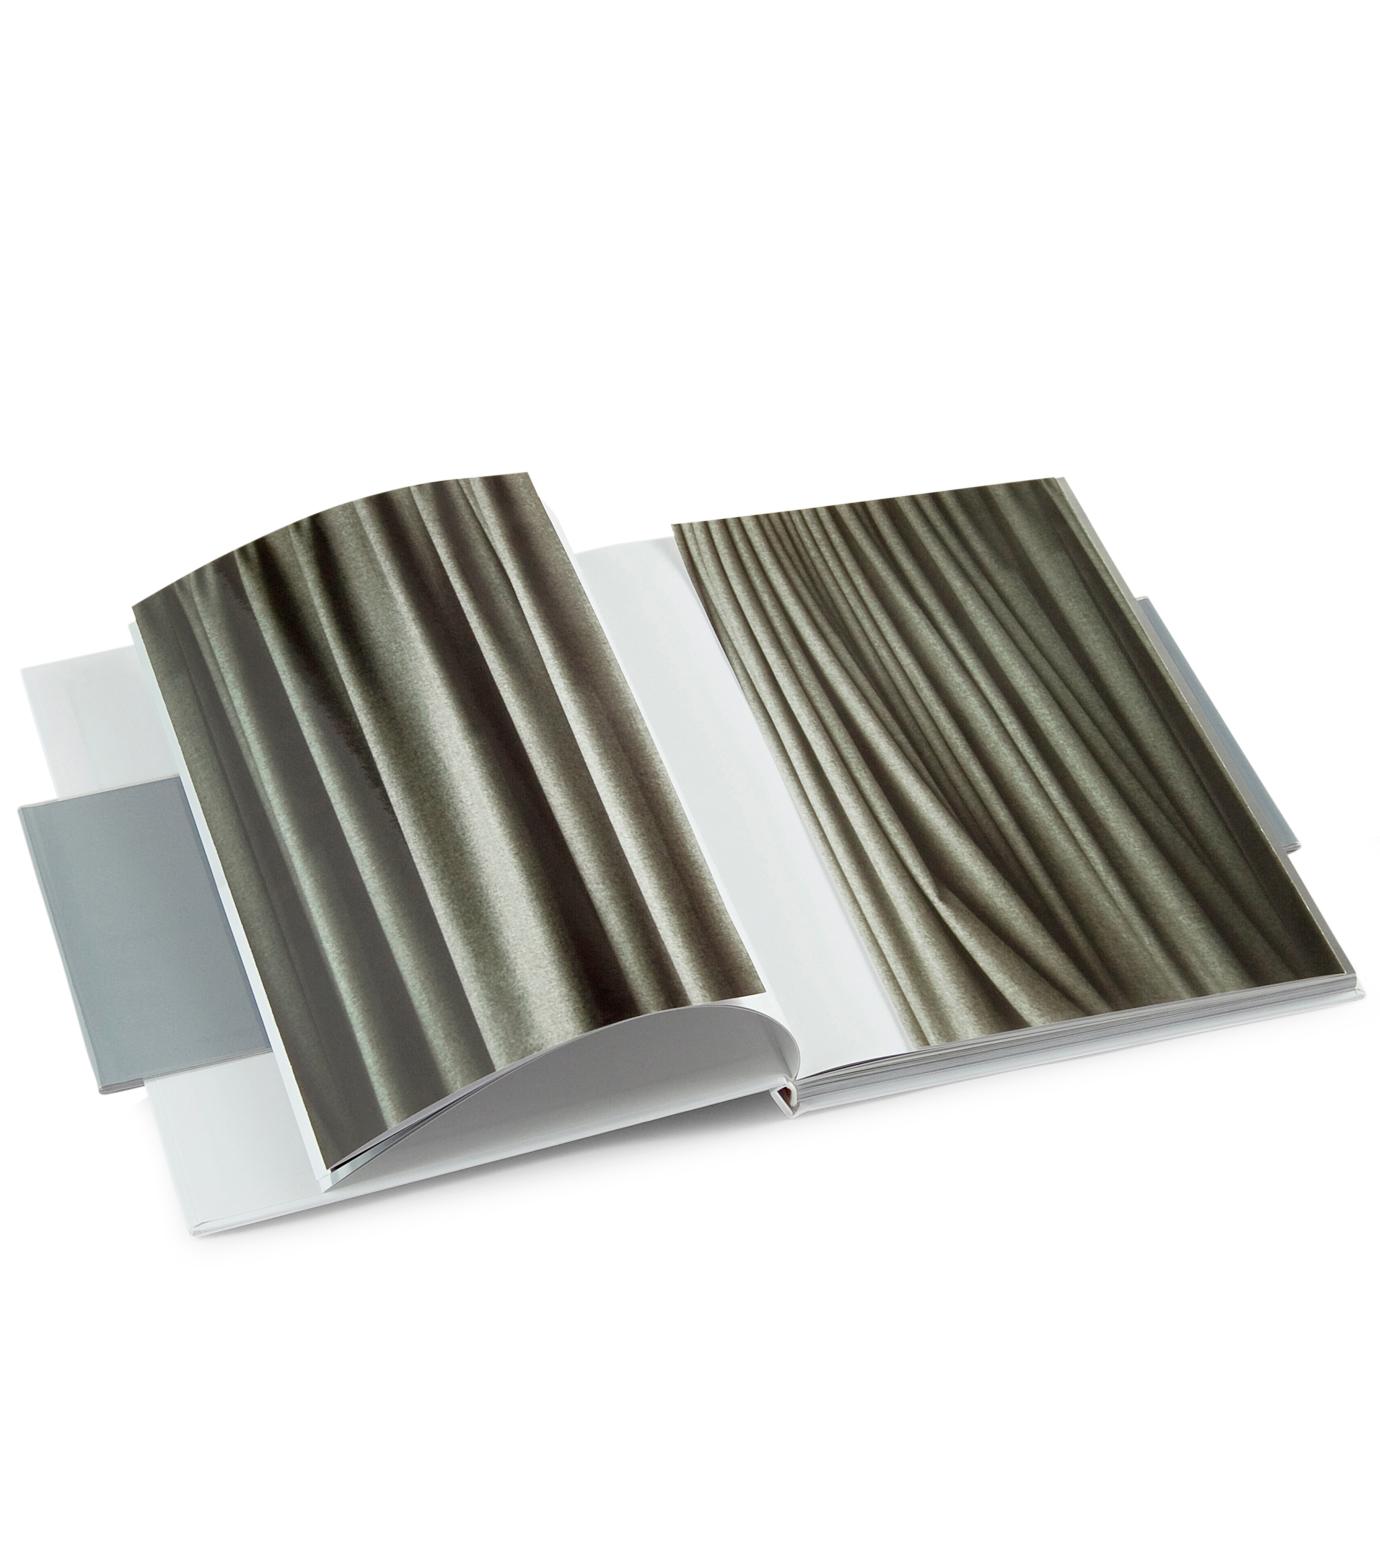 ArtBook(アートブック)のHedi slimane: intermission, 1.-WHITE-8158-374-4-4 拡大詳細画像2